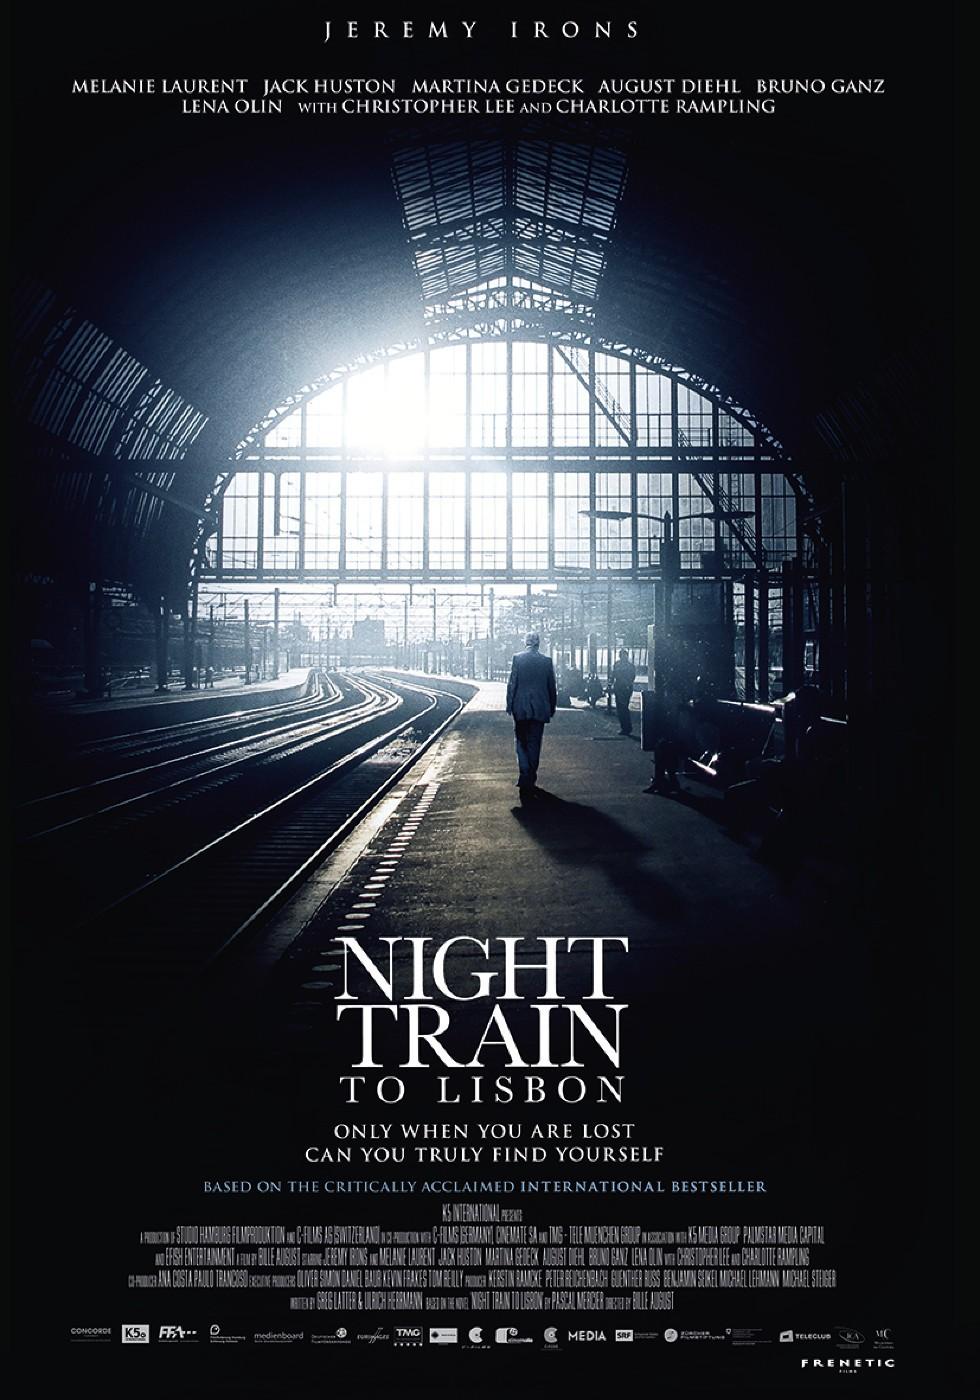 night-train-to-lisbon-poster.jpg